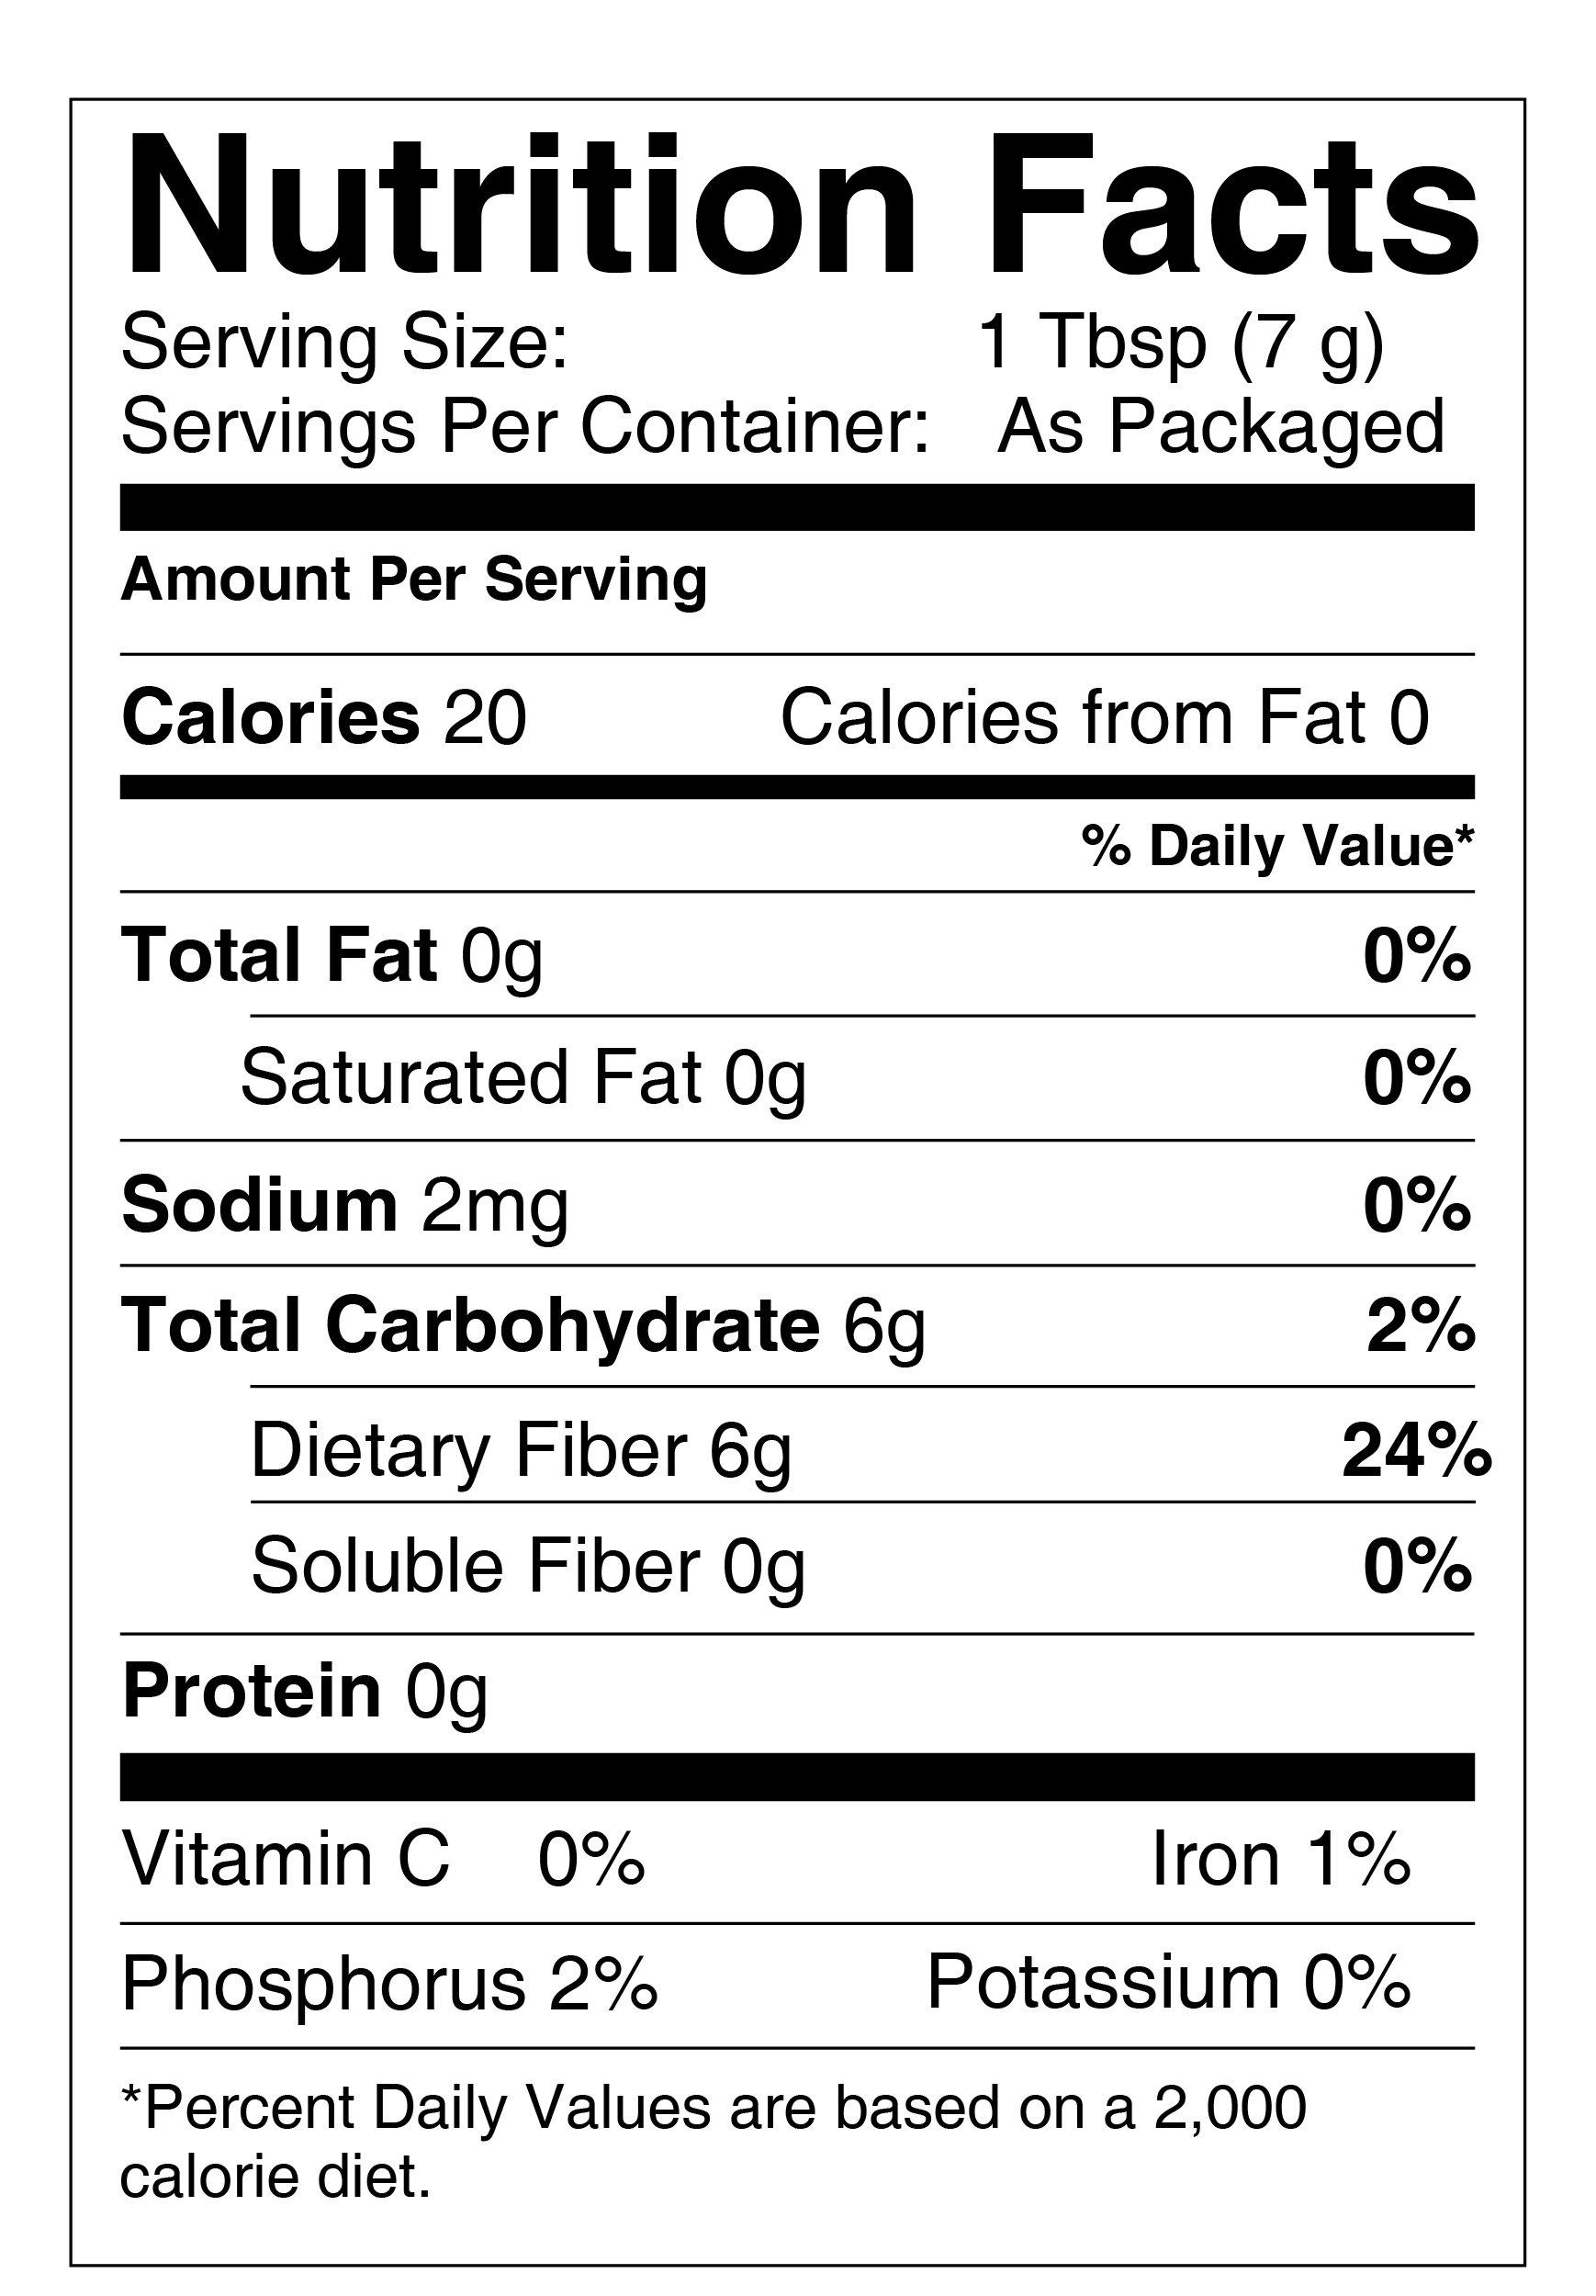 Guar Gum Powder (10 lb.) by Pure Organic Ingredients, Food Grade, Gluten-Free, Non-GMO, Thickening Agent by Pure Organic Ingredients (Image #3)